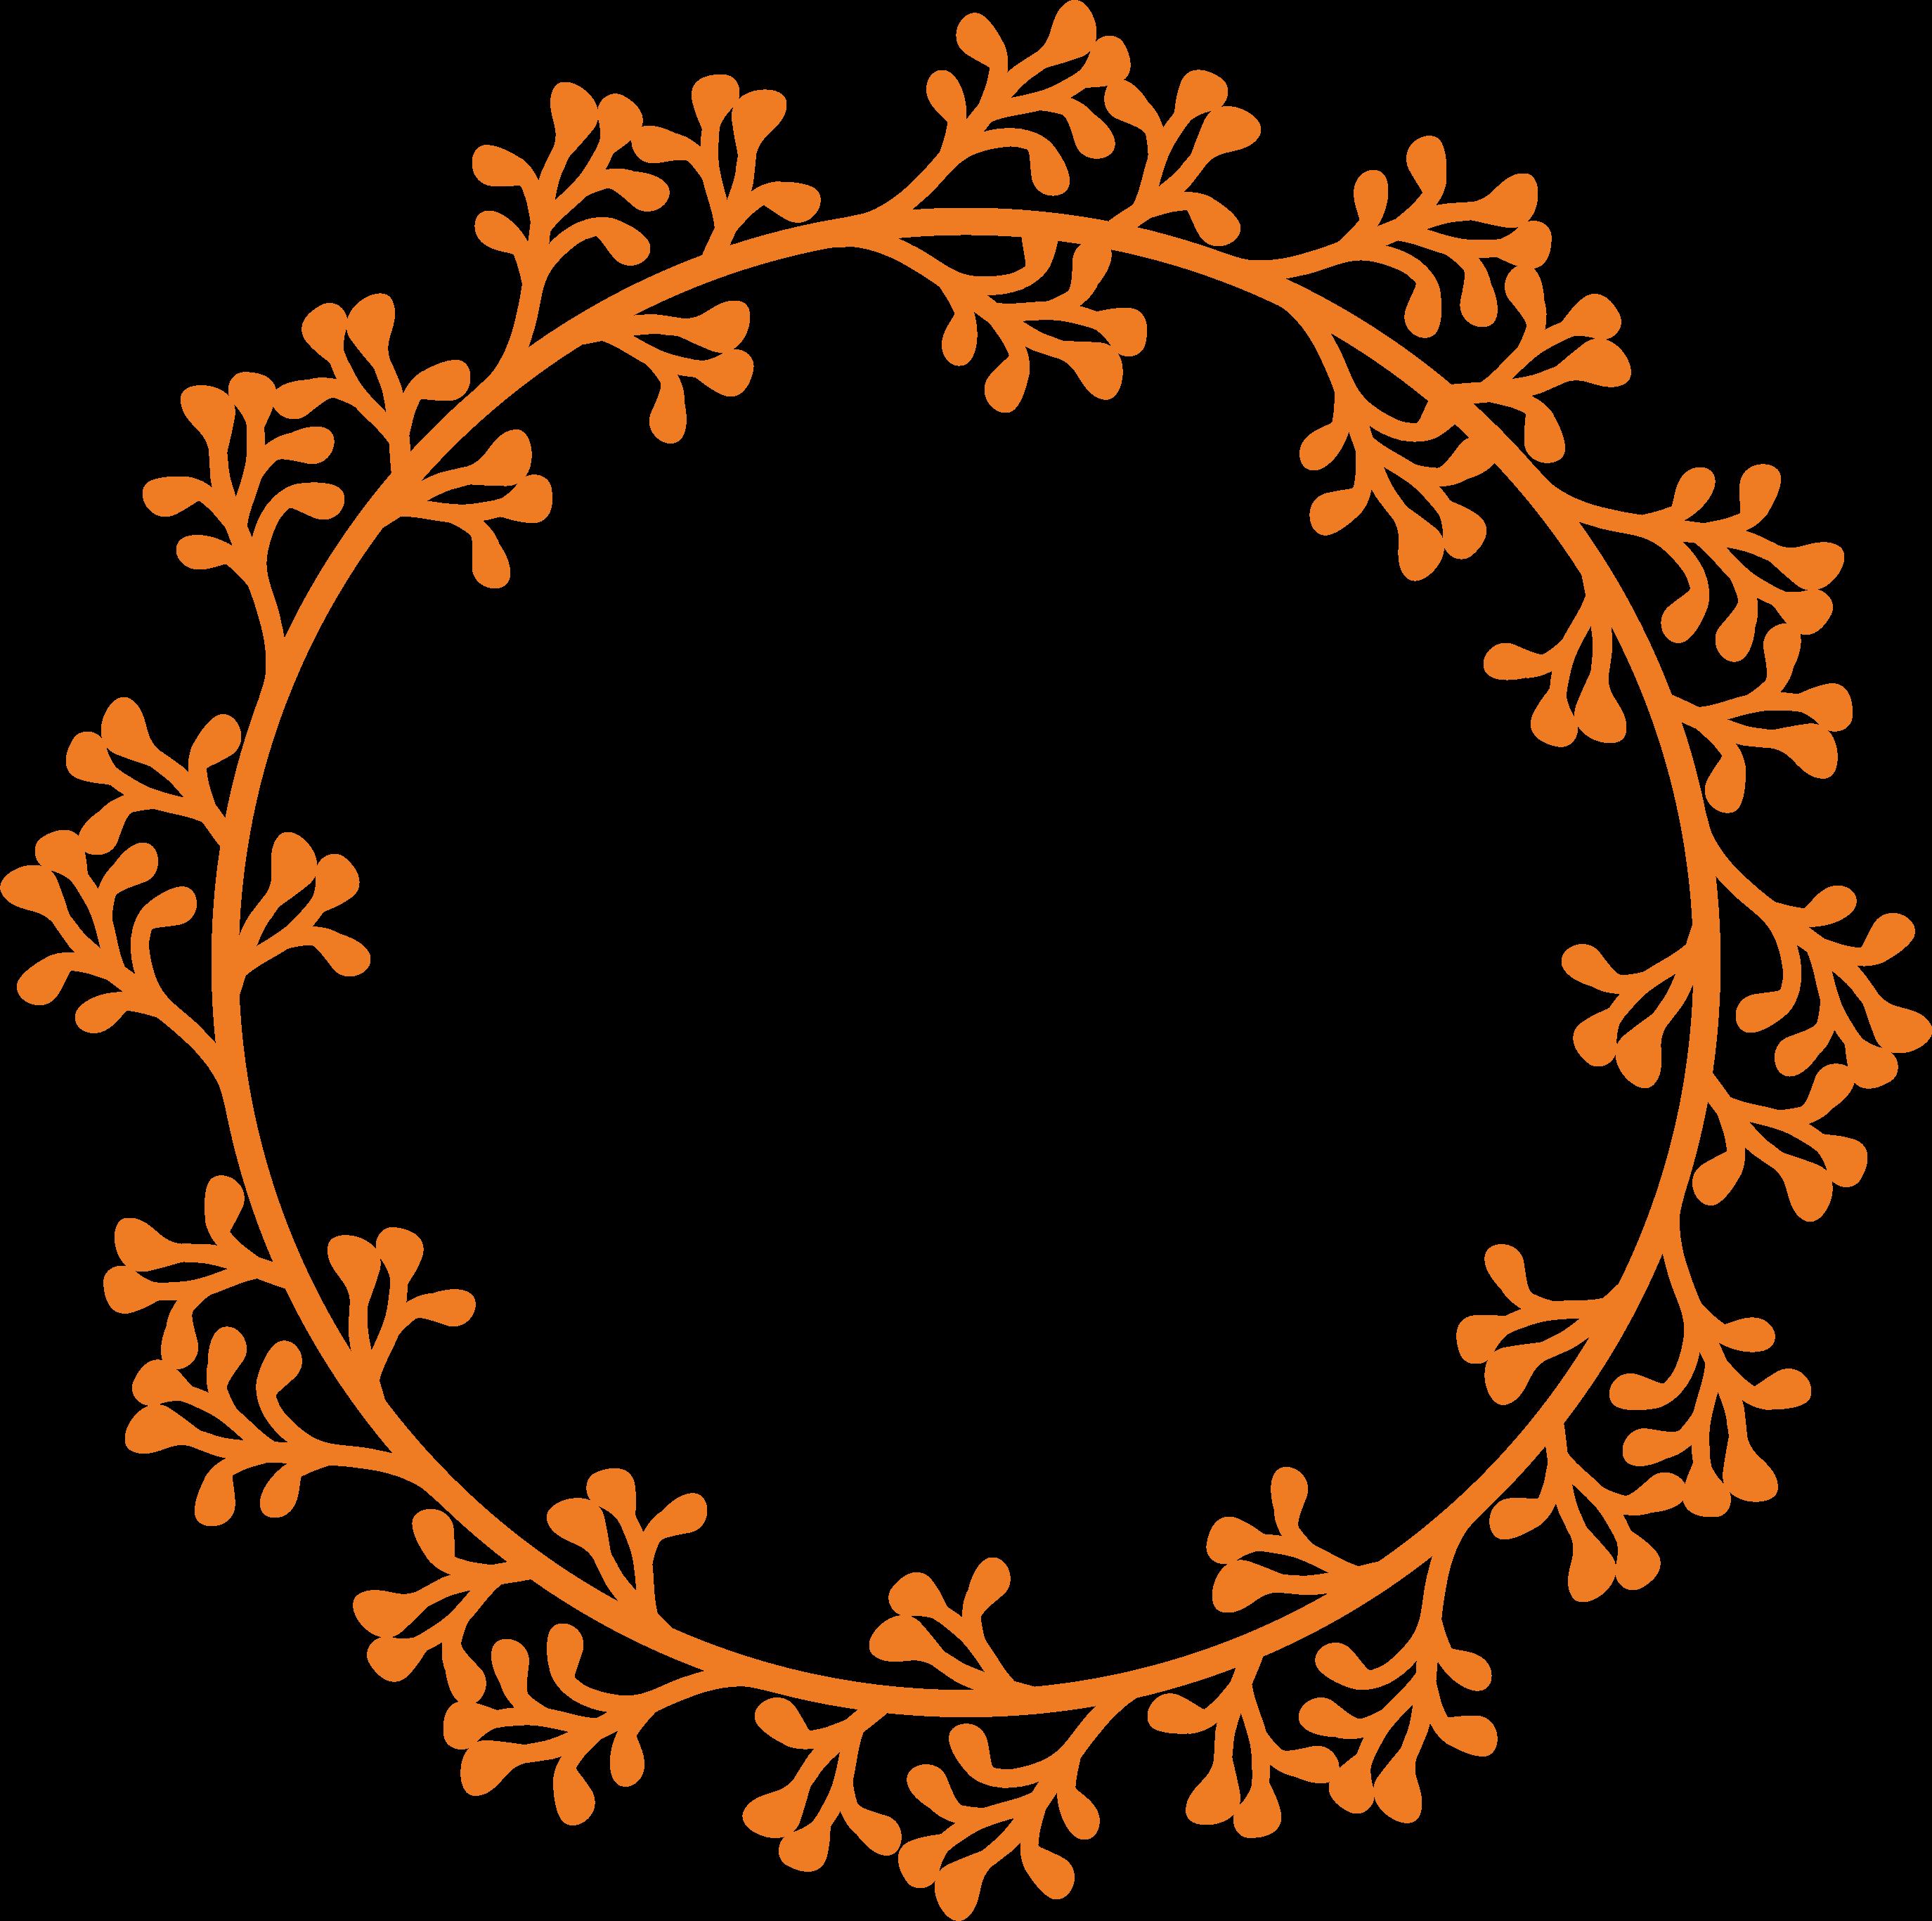 My Favorite Fall Wreath SVG Cut File